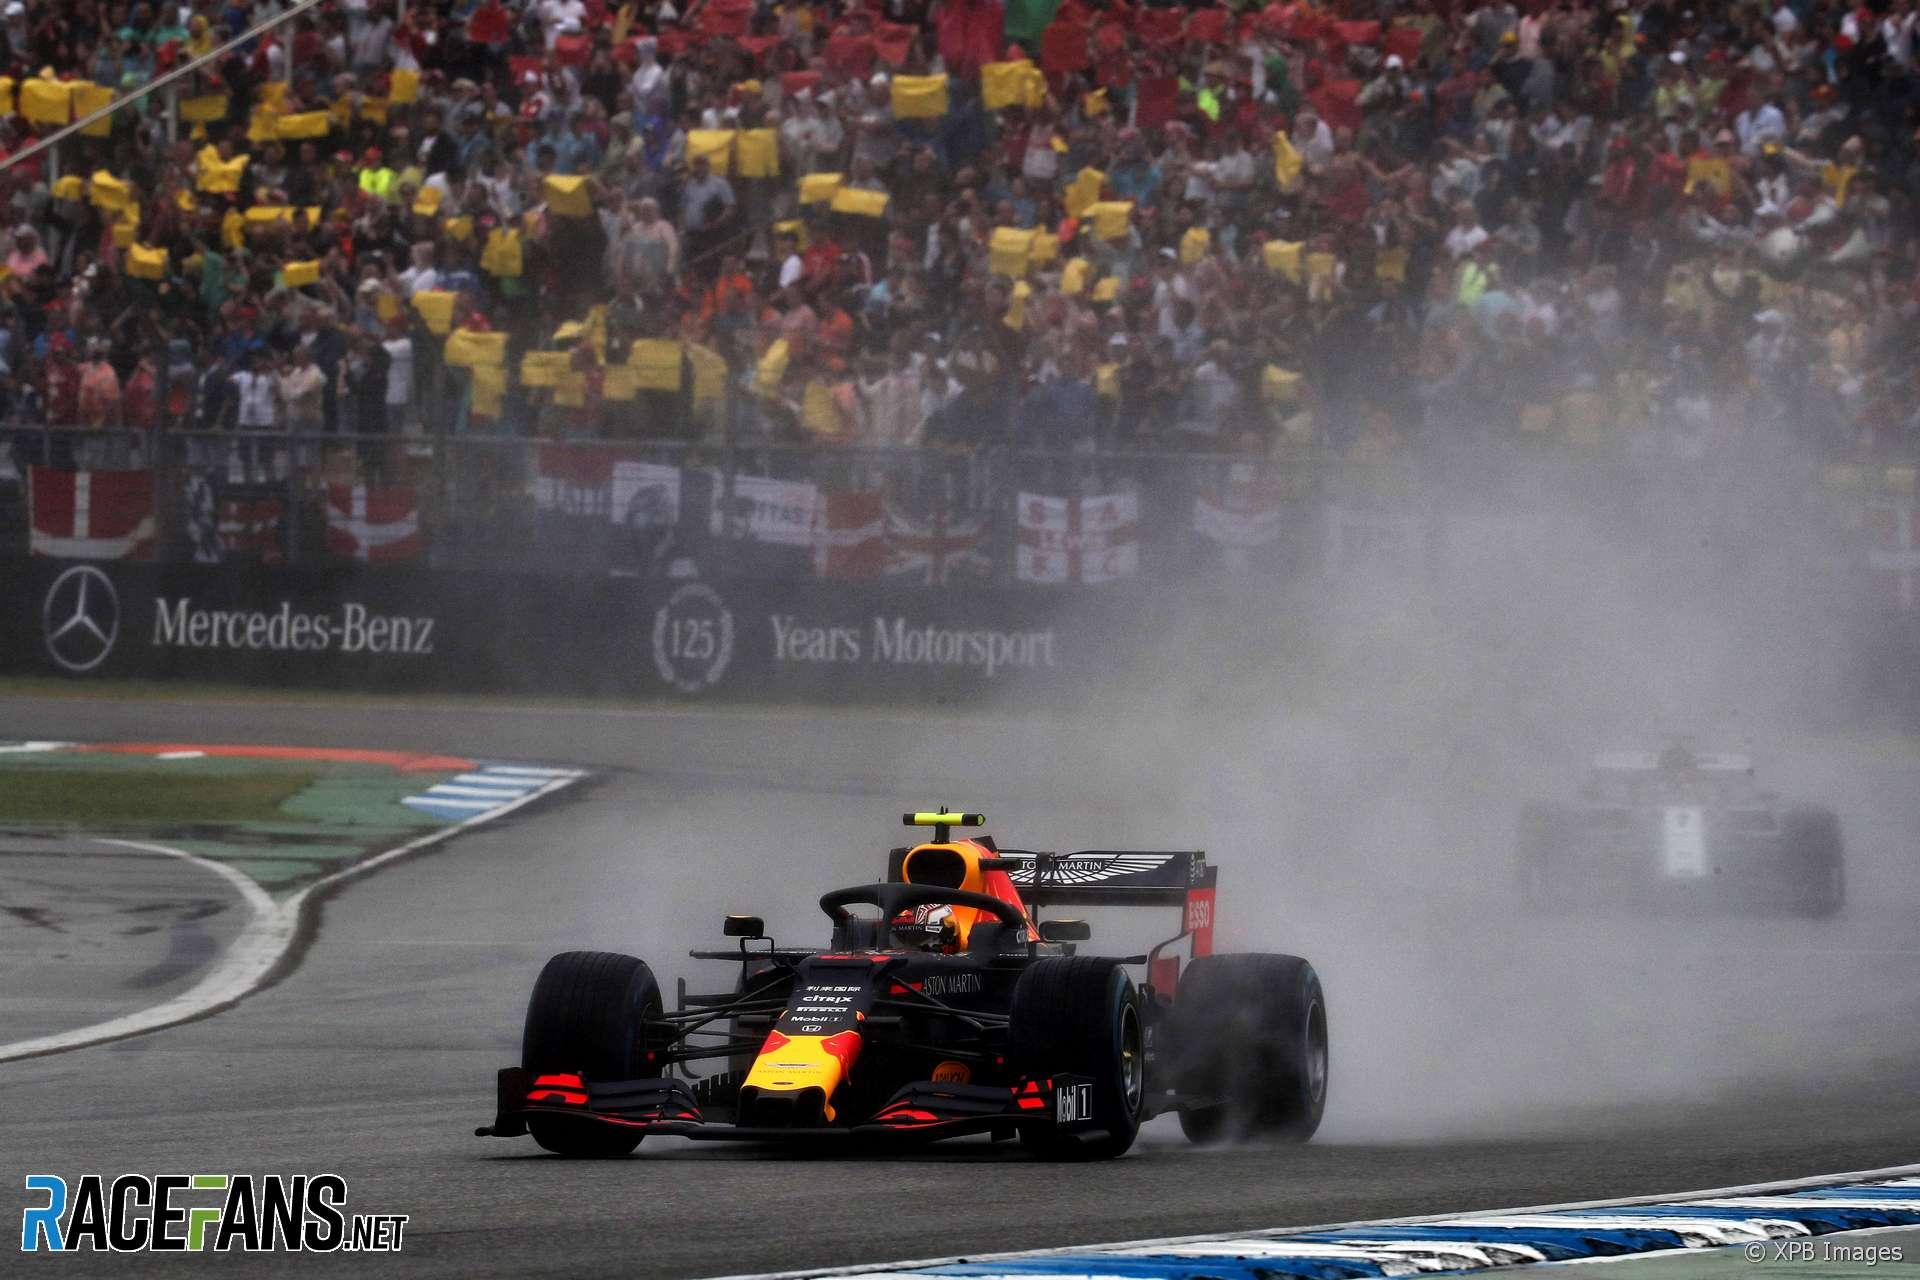 Pierre Gasly, Red Bull, Hockenheimring, 2019